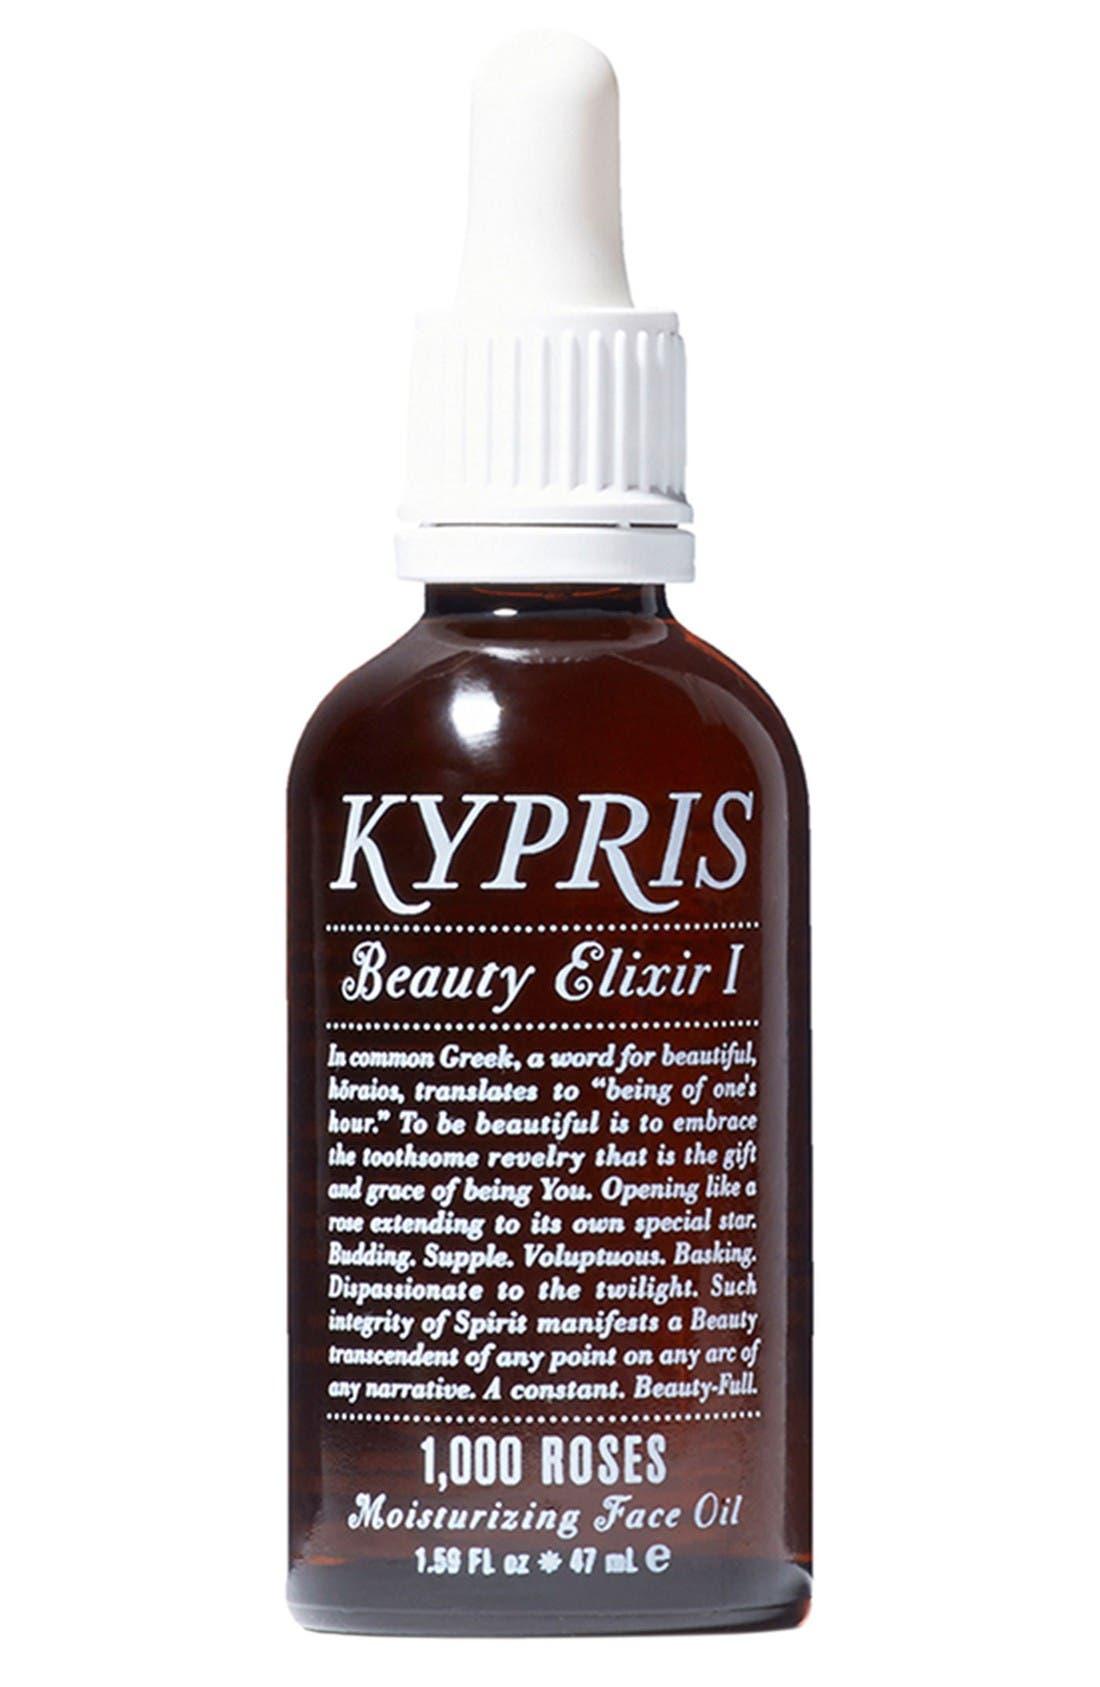 Main Image - KYPRIS Beauty Beauty Elixir I: 1000 Roses